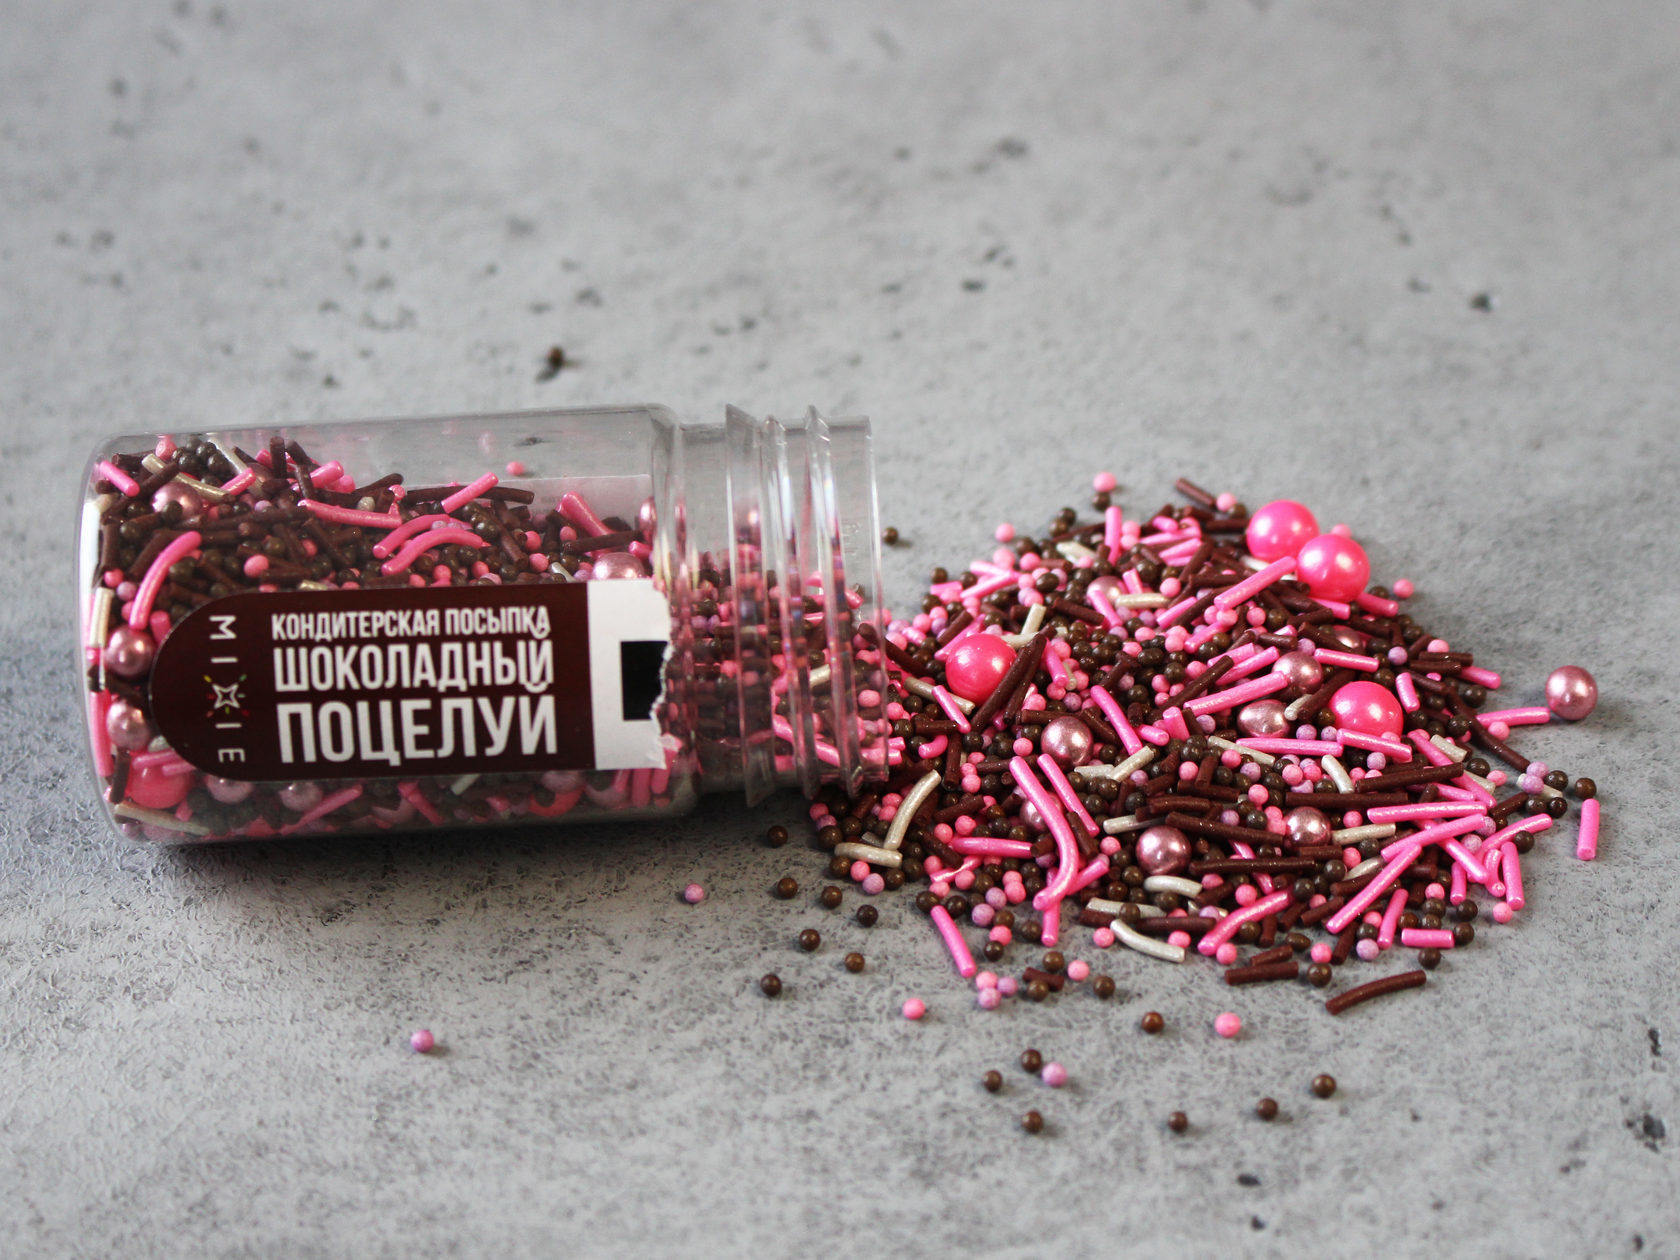 Посыпка «Шоколадный поцелуй», 50 гр